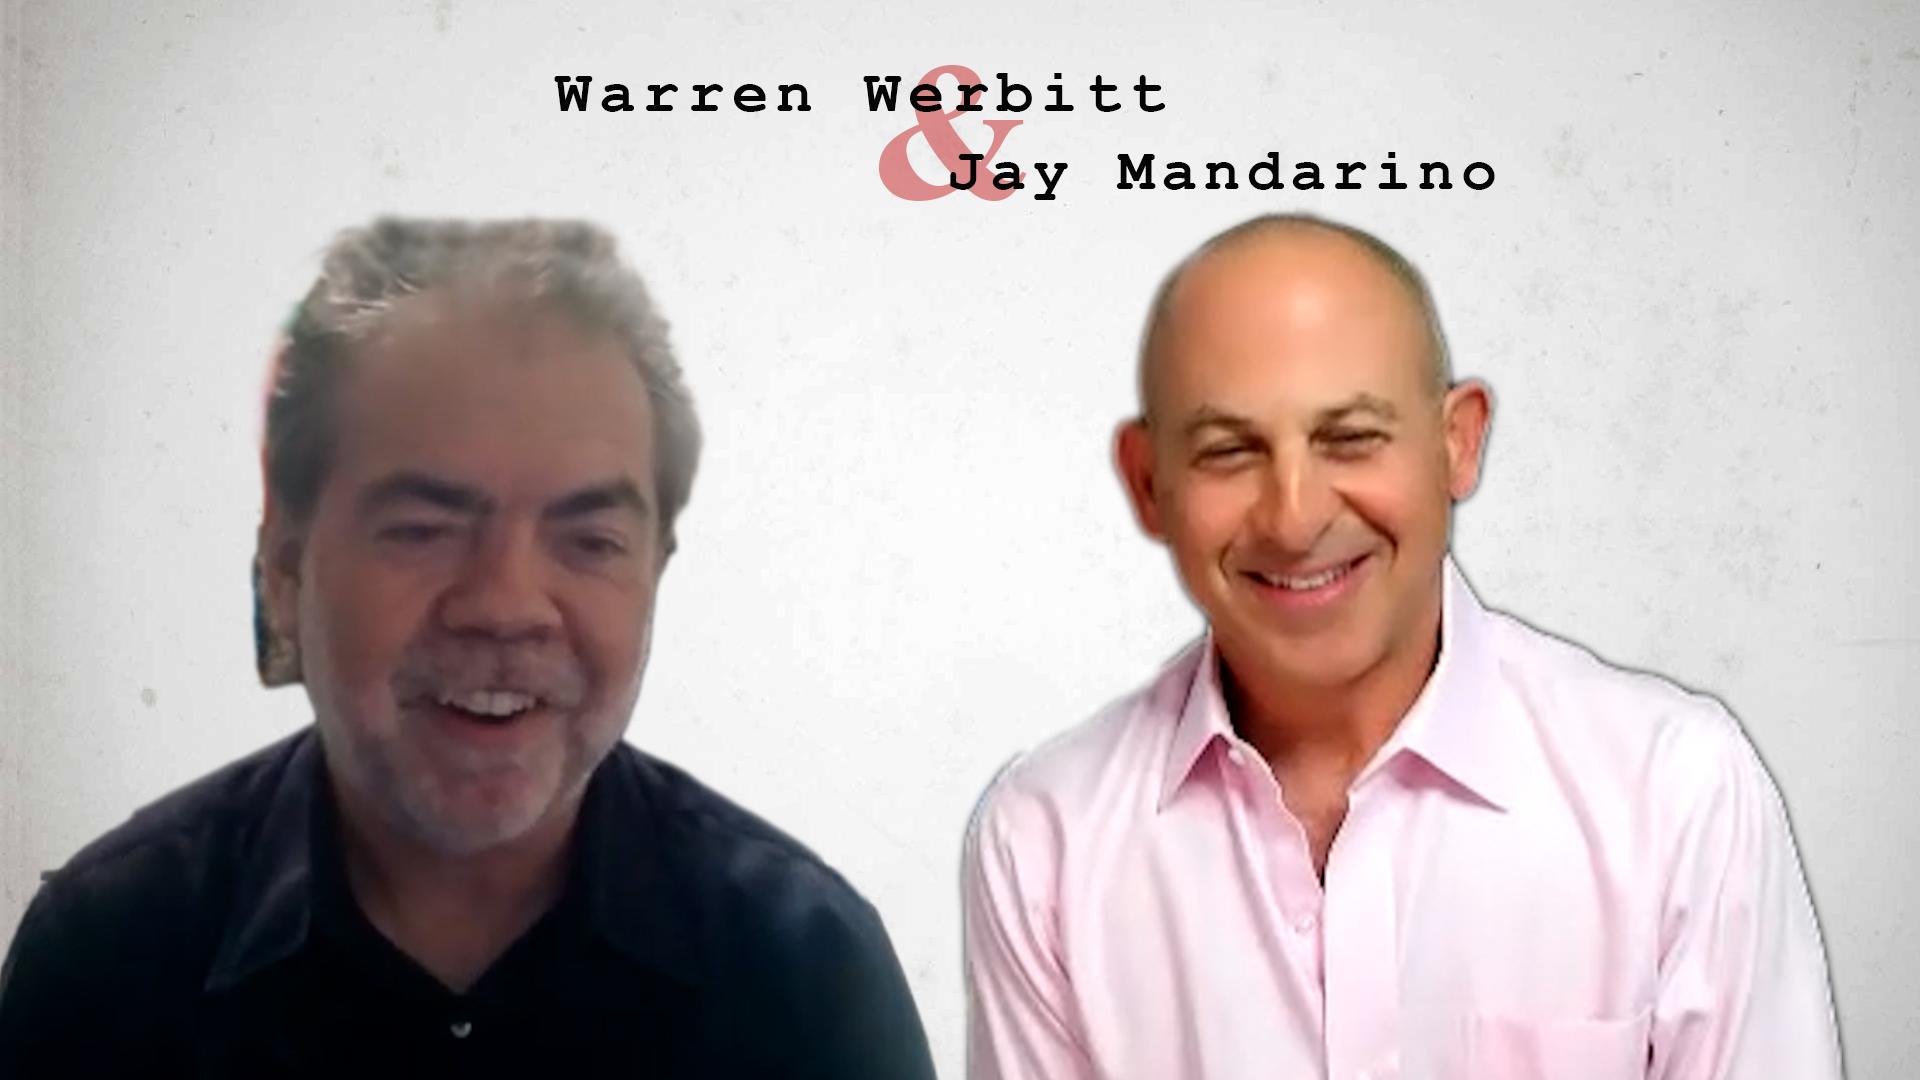 Video preview: Warren Werbitt Goes Printer to Printer with Jay Mandarino